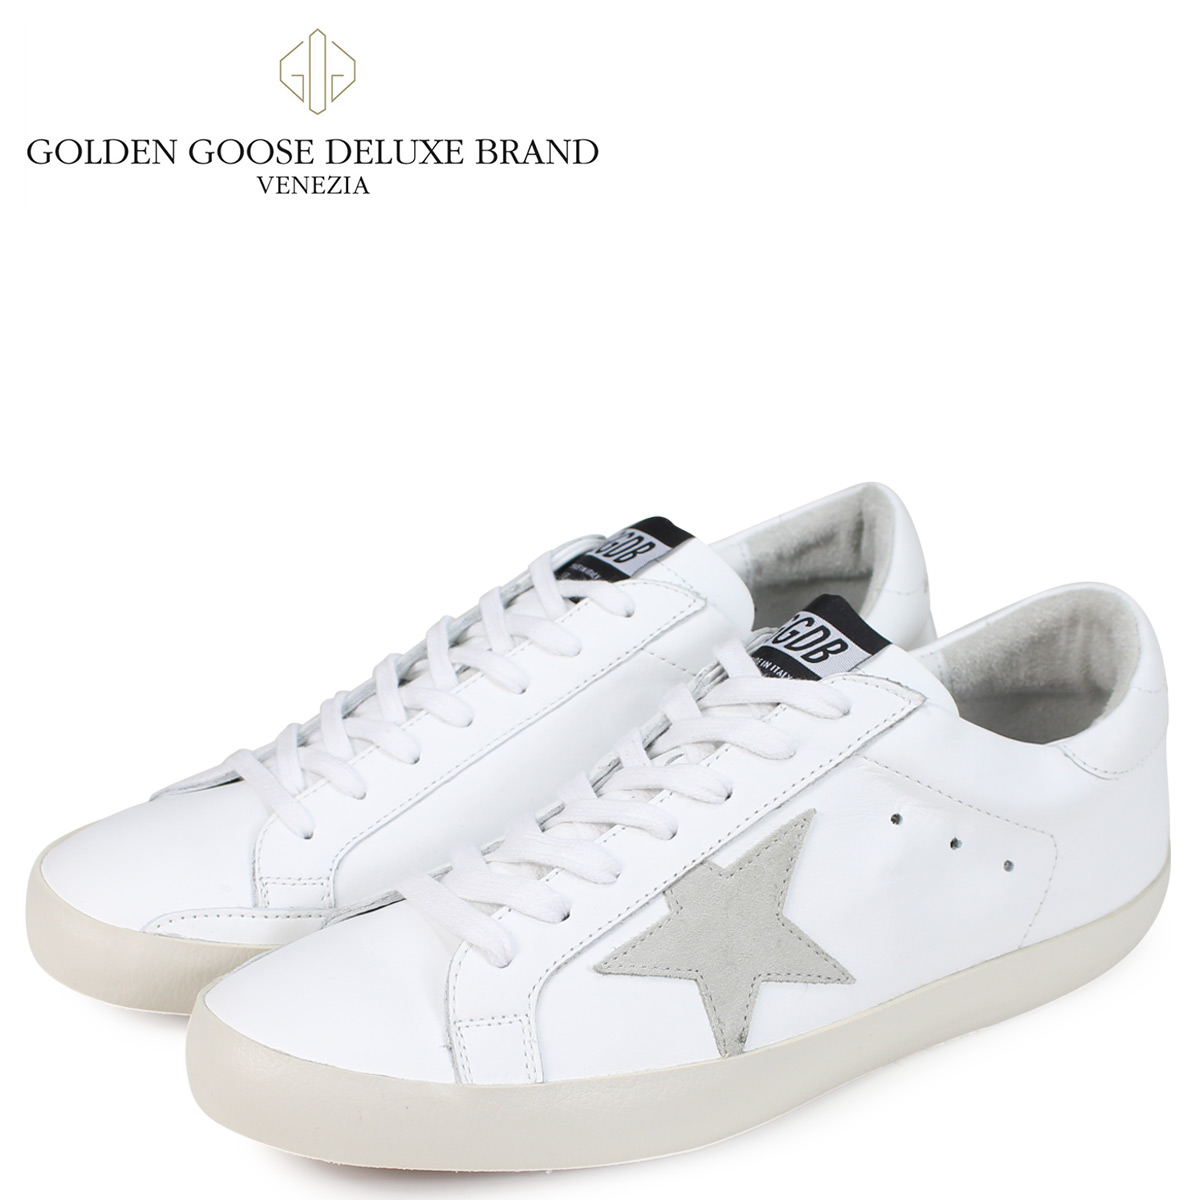 Golden Goose ゴールデングース スニーカー メンズ スーパースター SNEAKERS SUPERSTAR ホワイト 白 G33MS590 G68